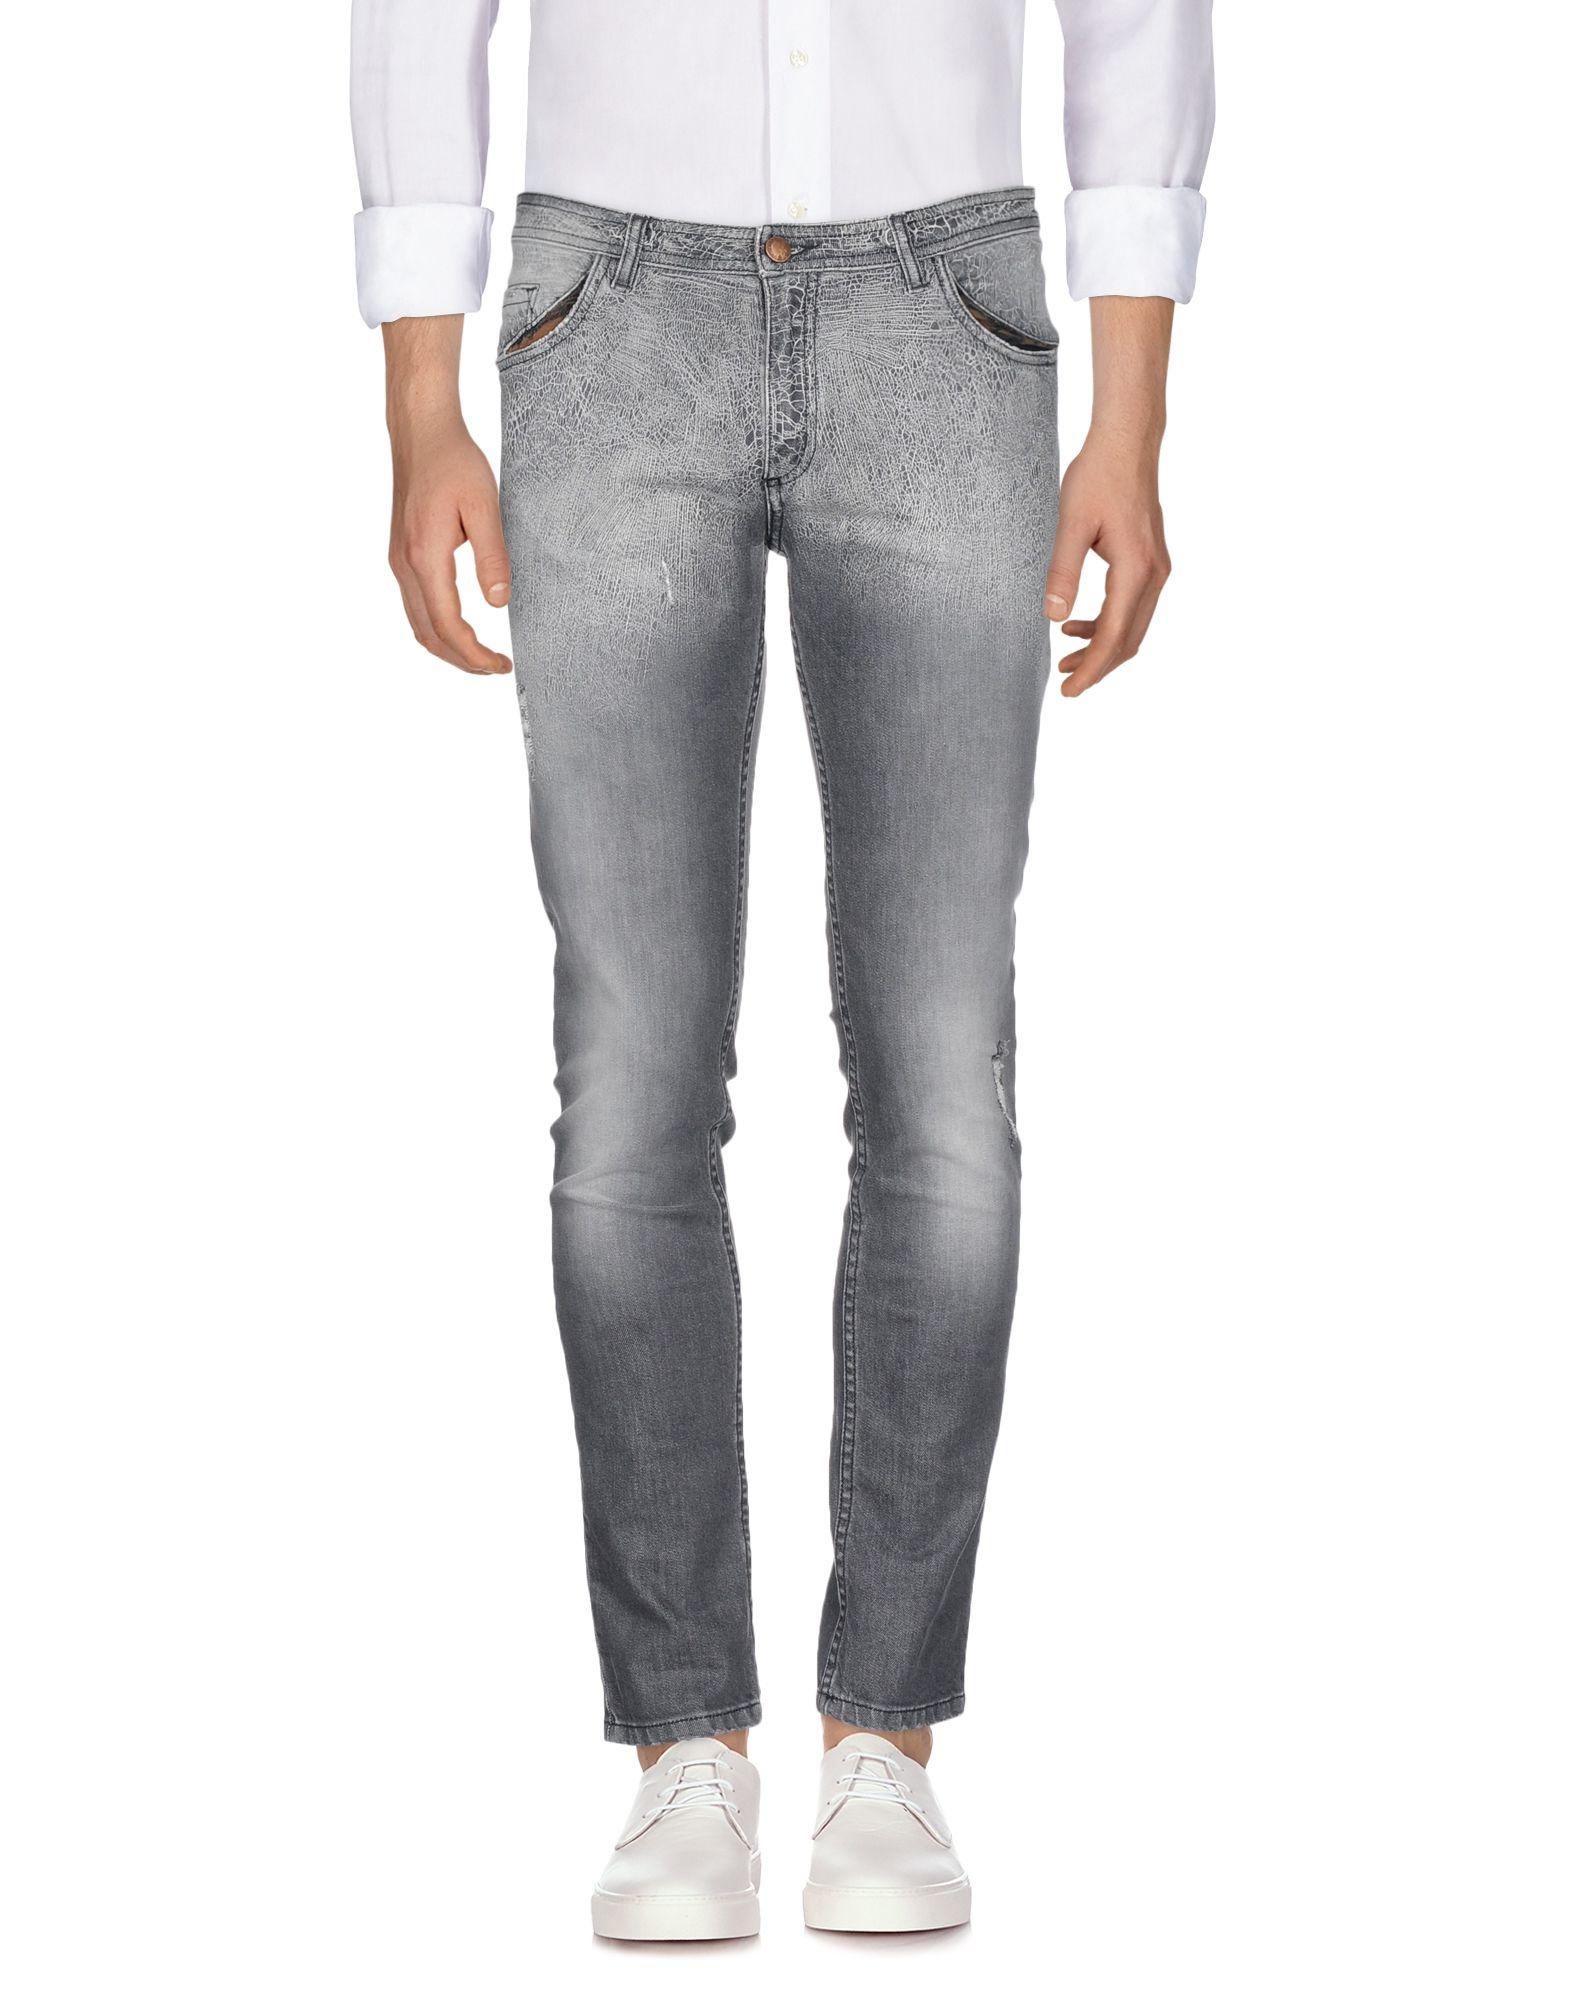 Pantaloni Jeans Tom Rebl Uomo - Acquista online su